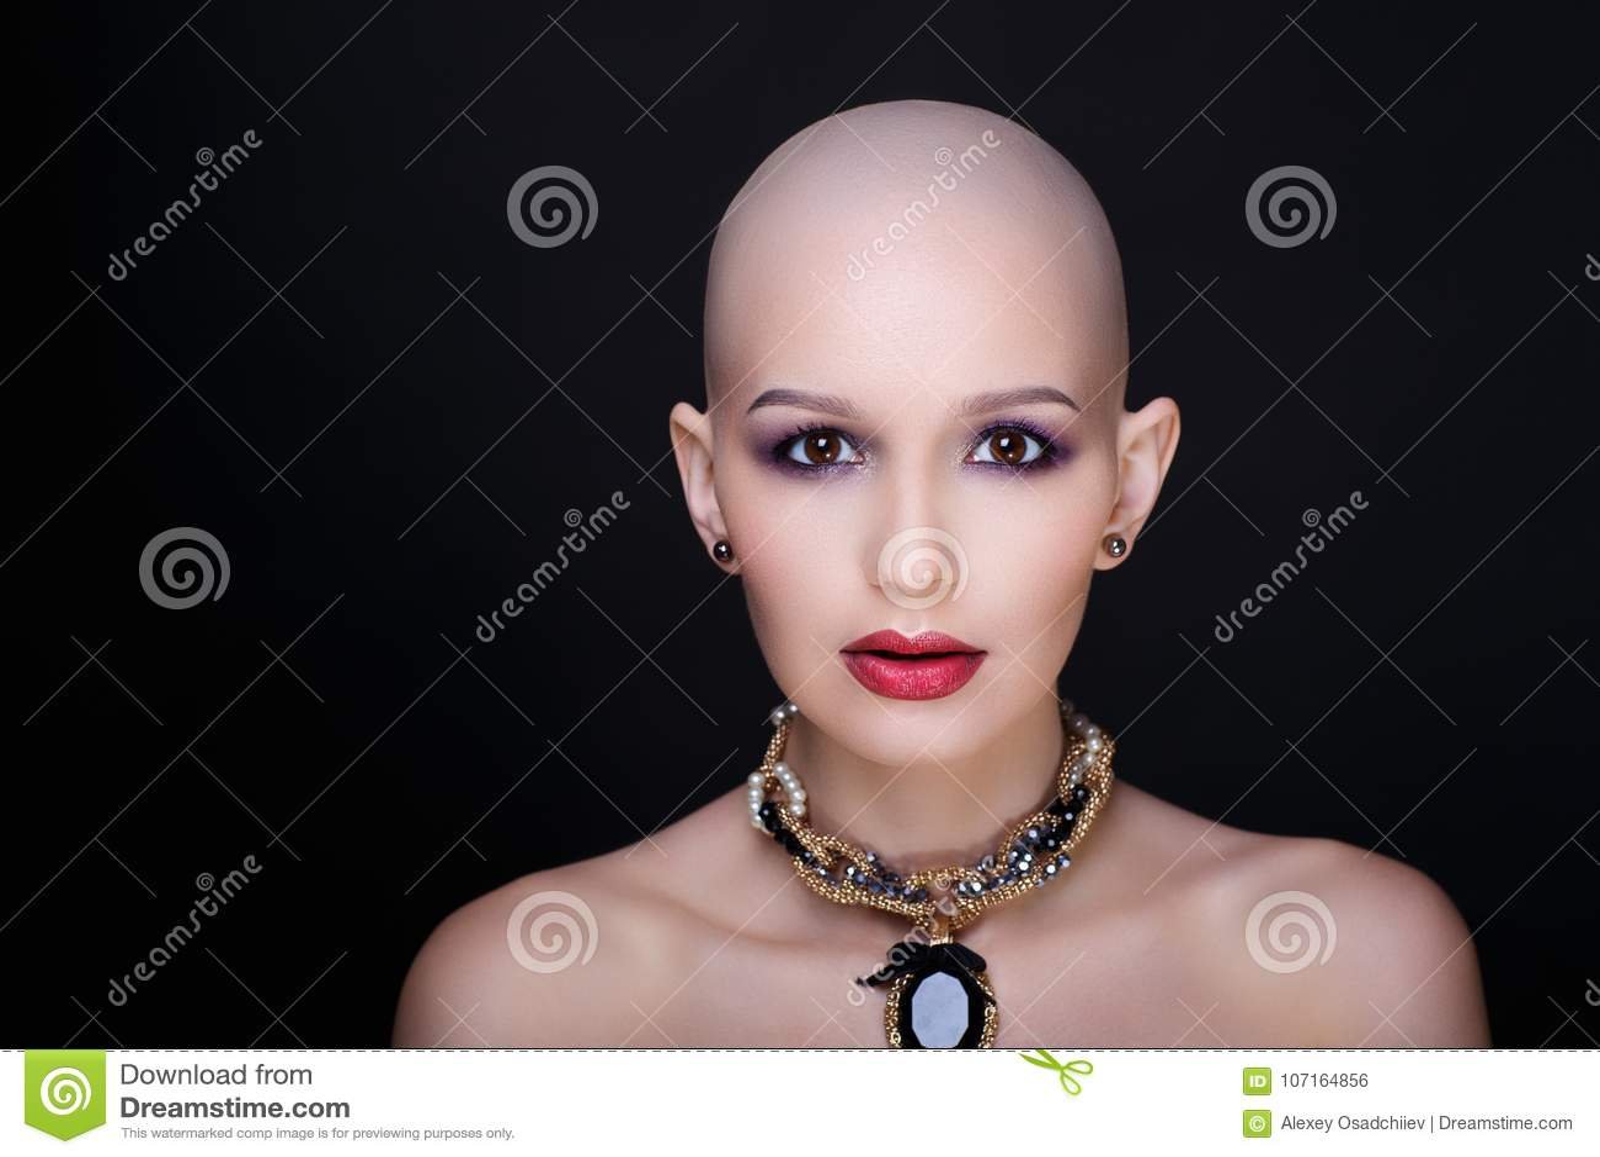 Bald Women Naked